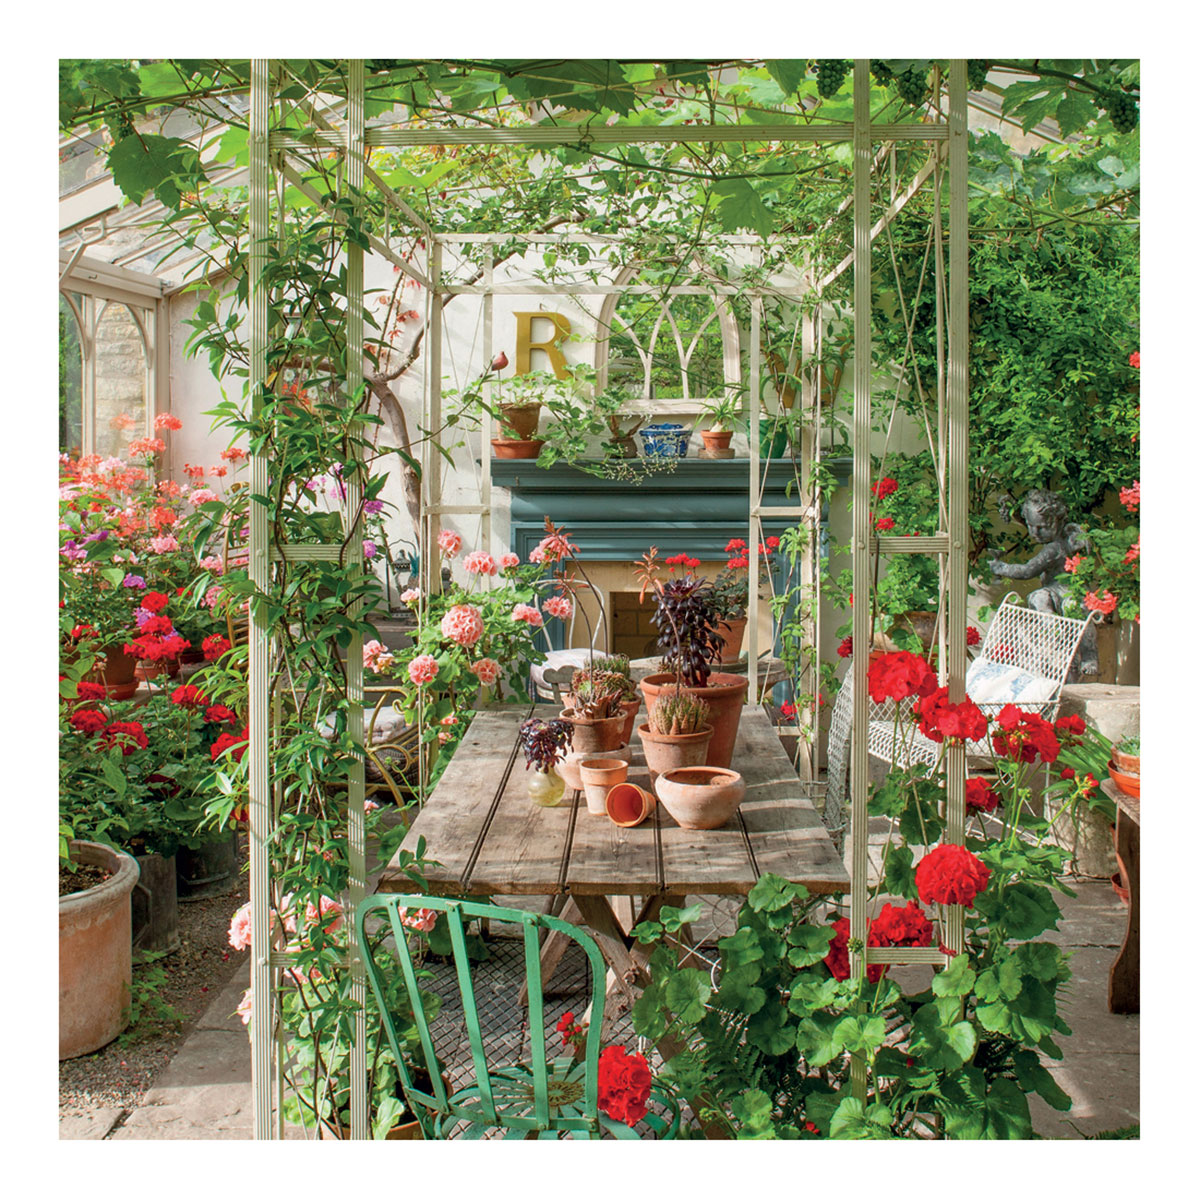 BBC Gardeners' World - The Lodge Greeting Card